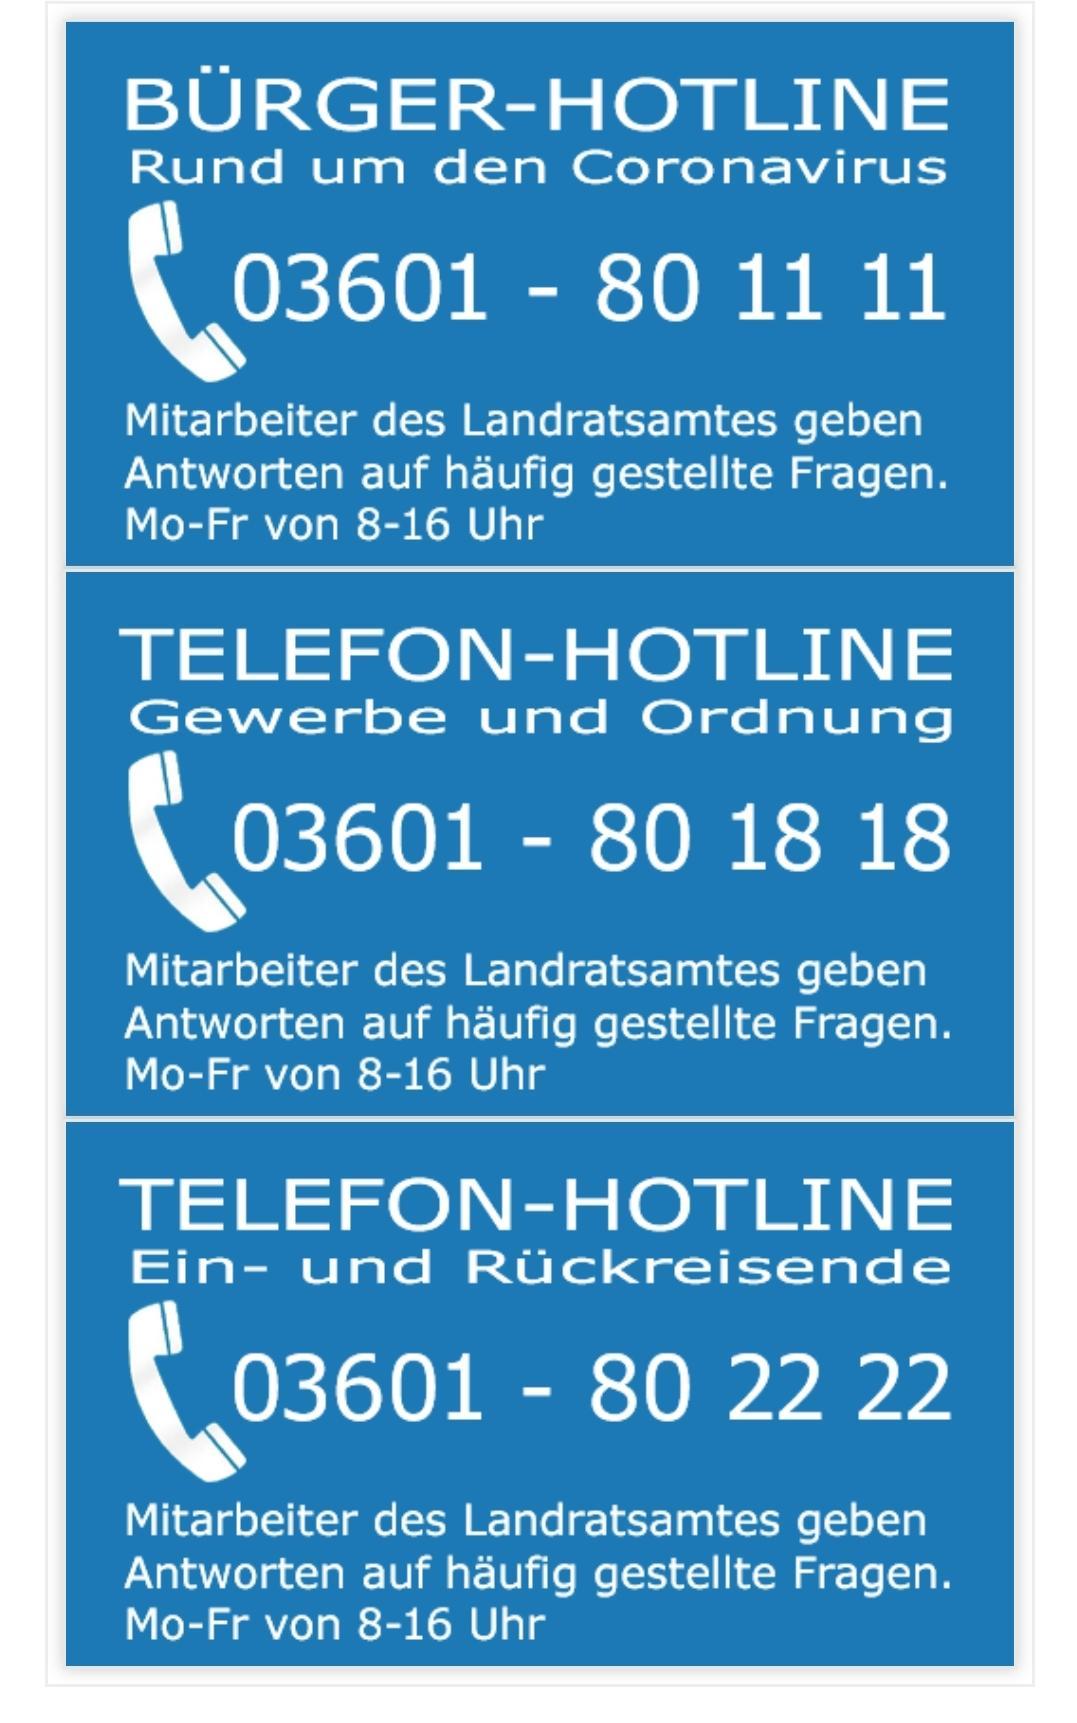 Bürger-Hotline des Landratsamtes